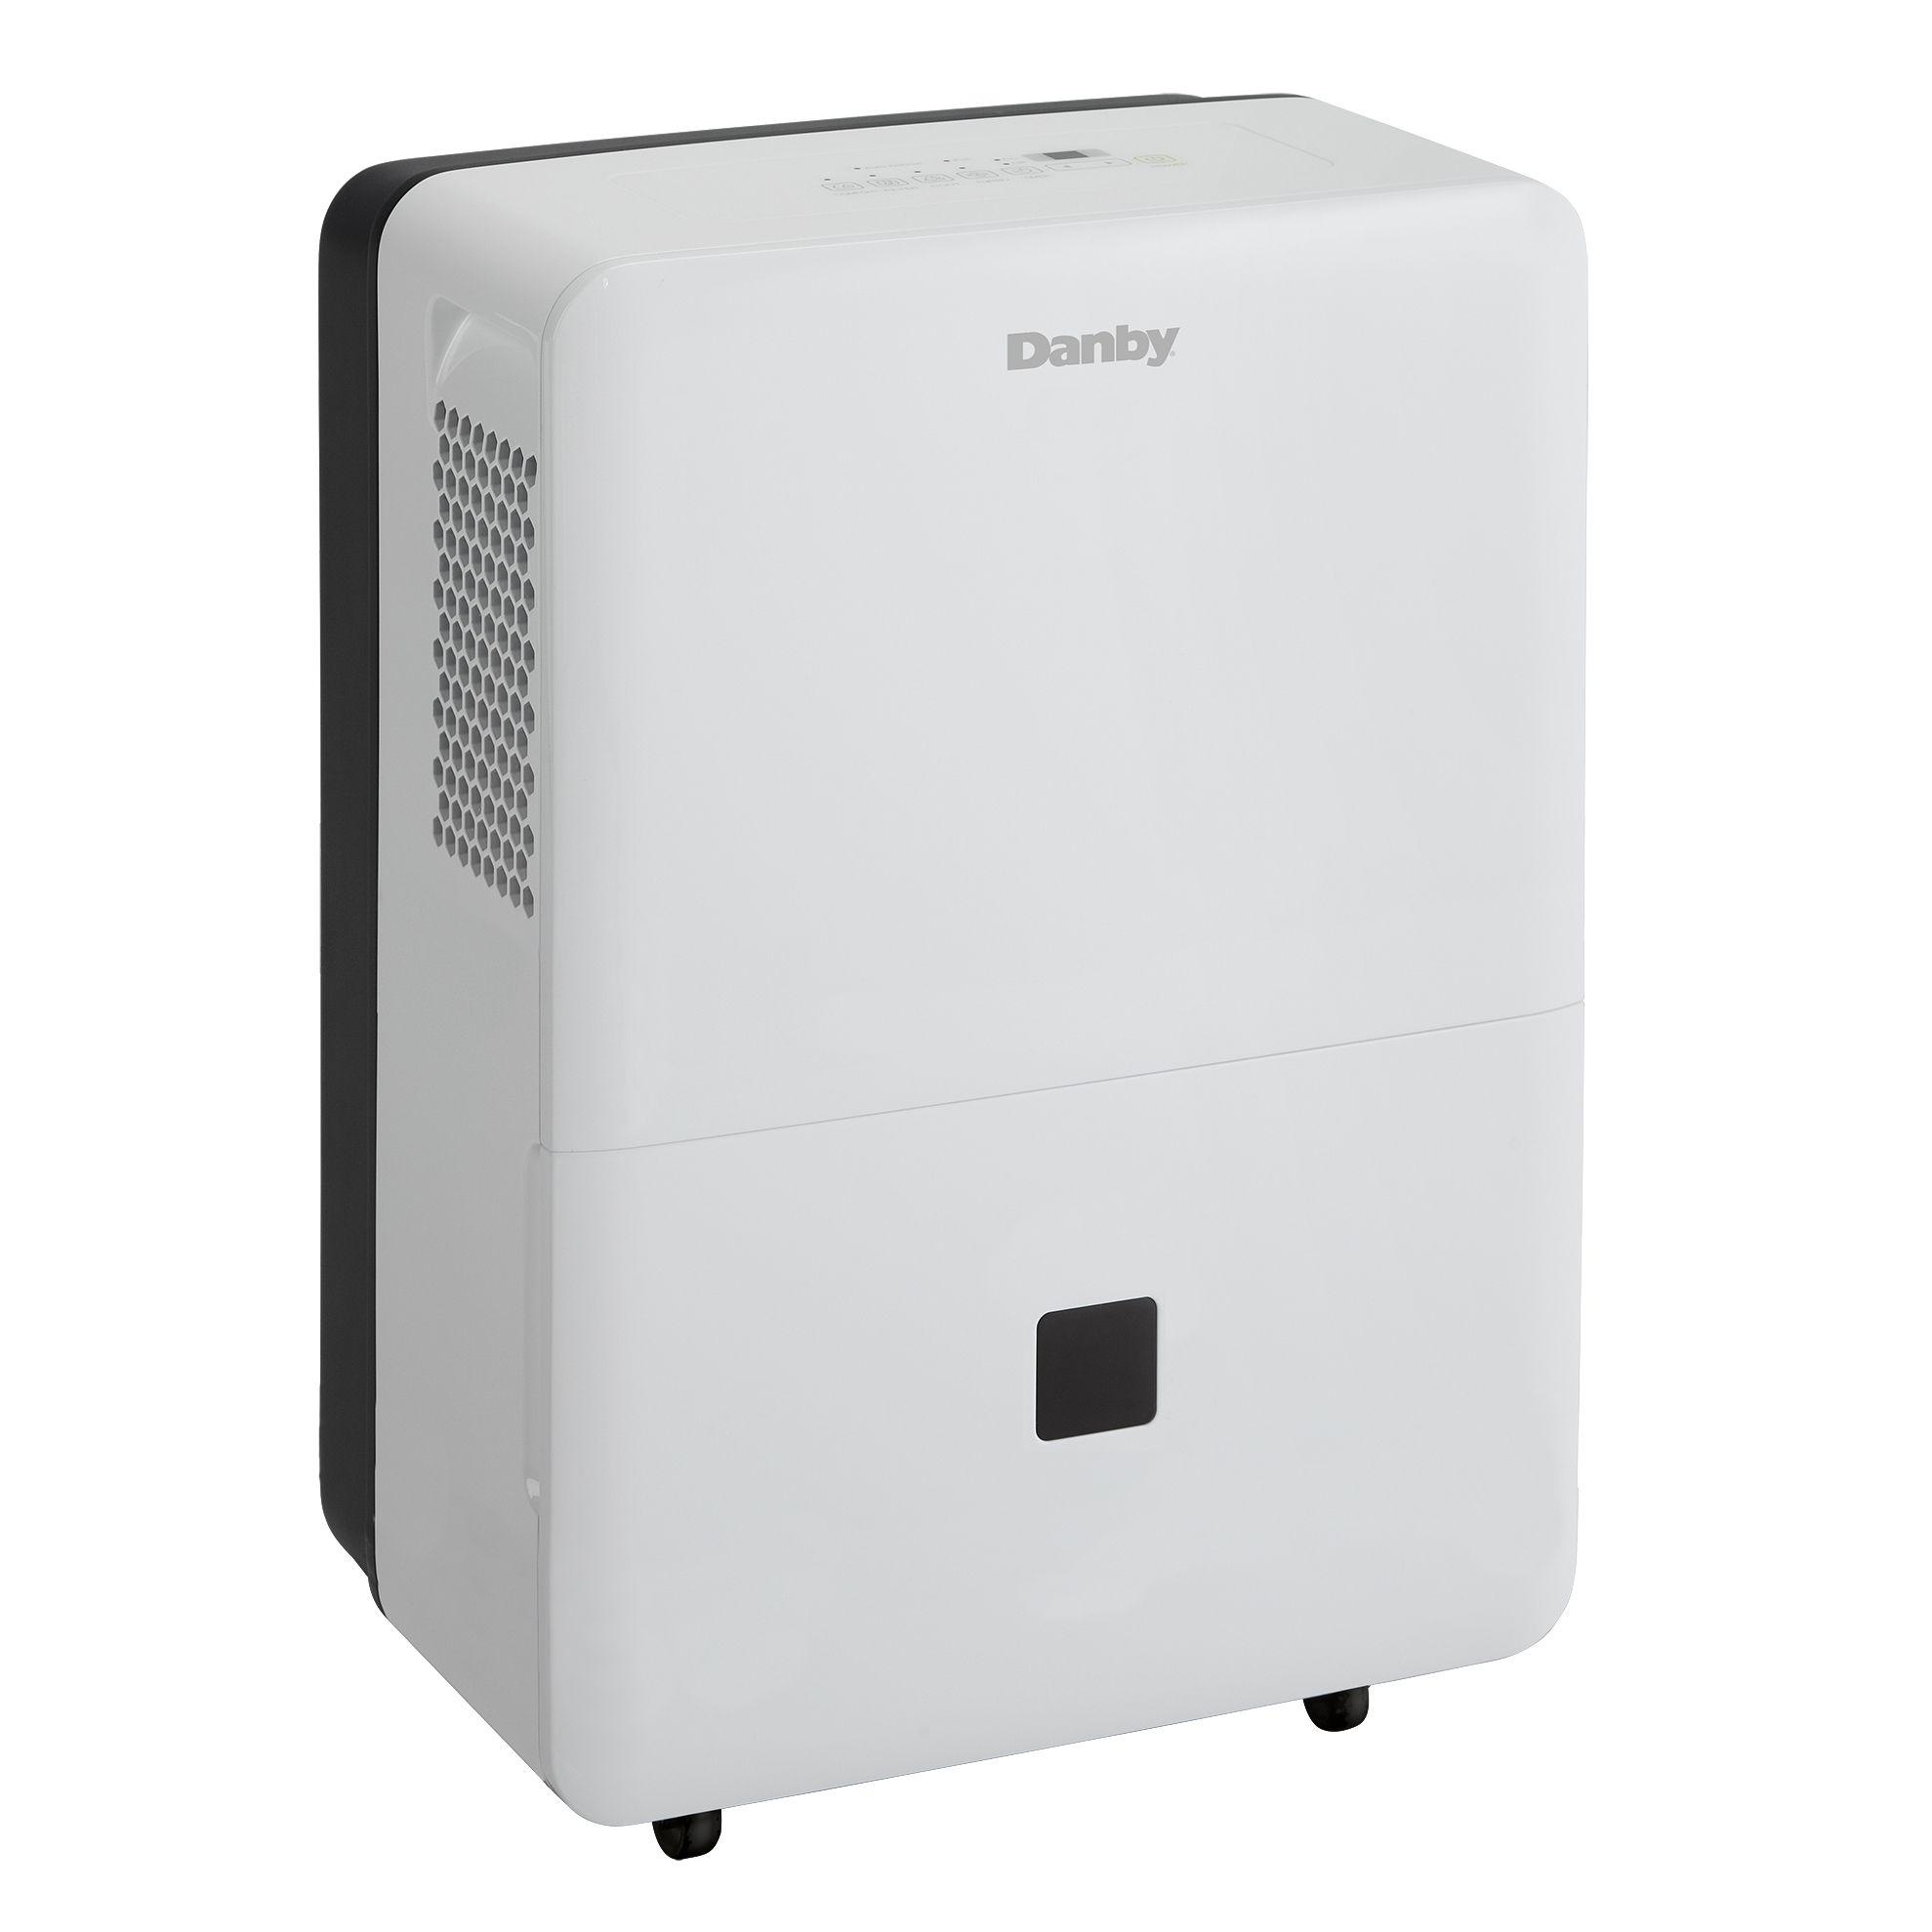 Danby 60 Pint Portable Energy Star Low Temp Dehumidifier